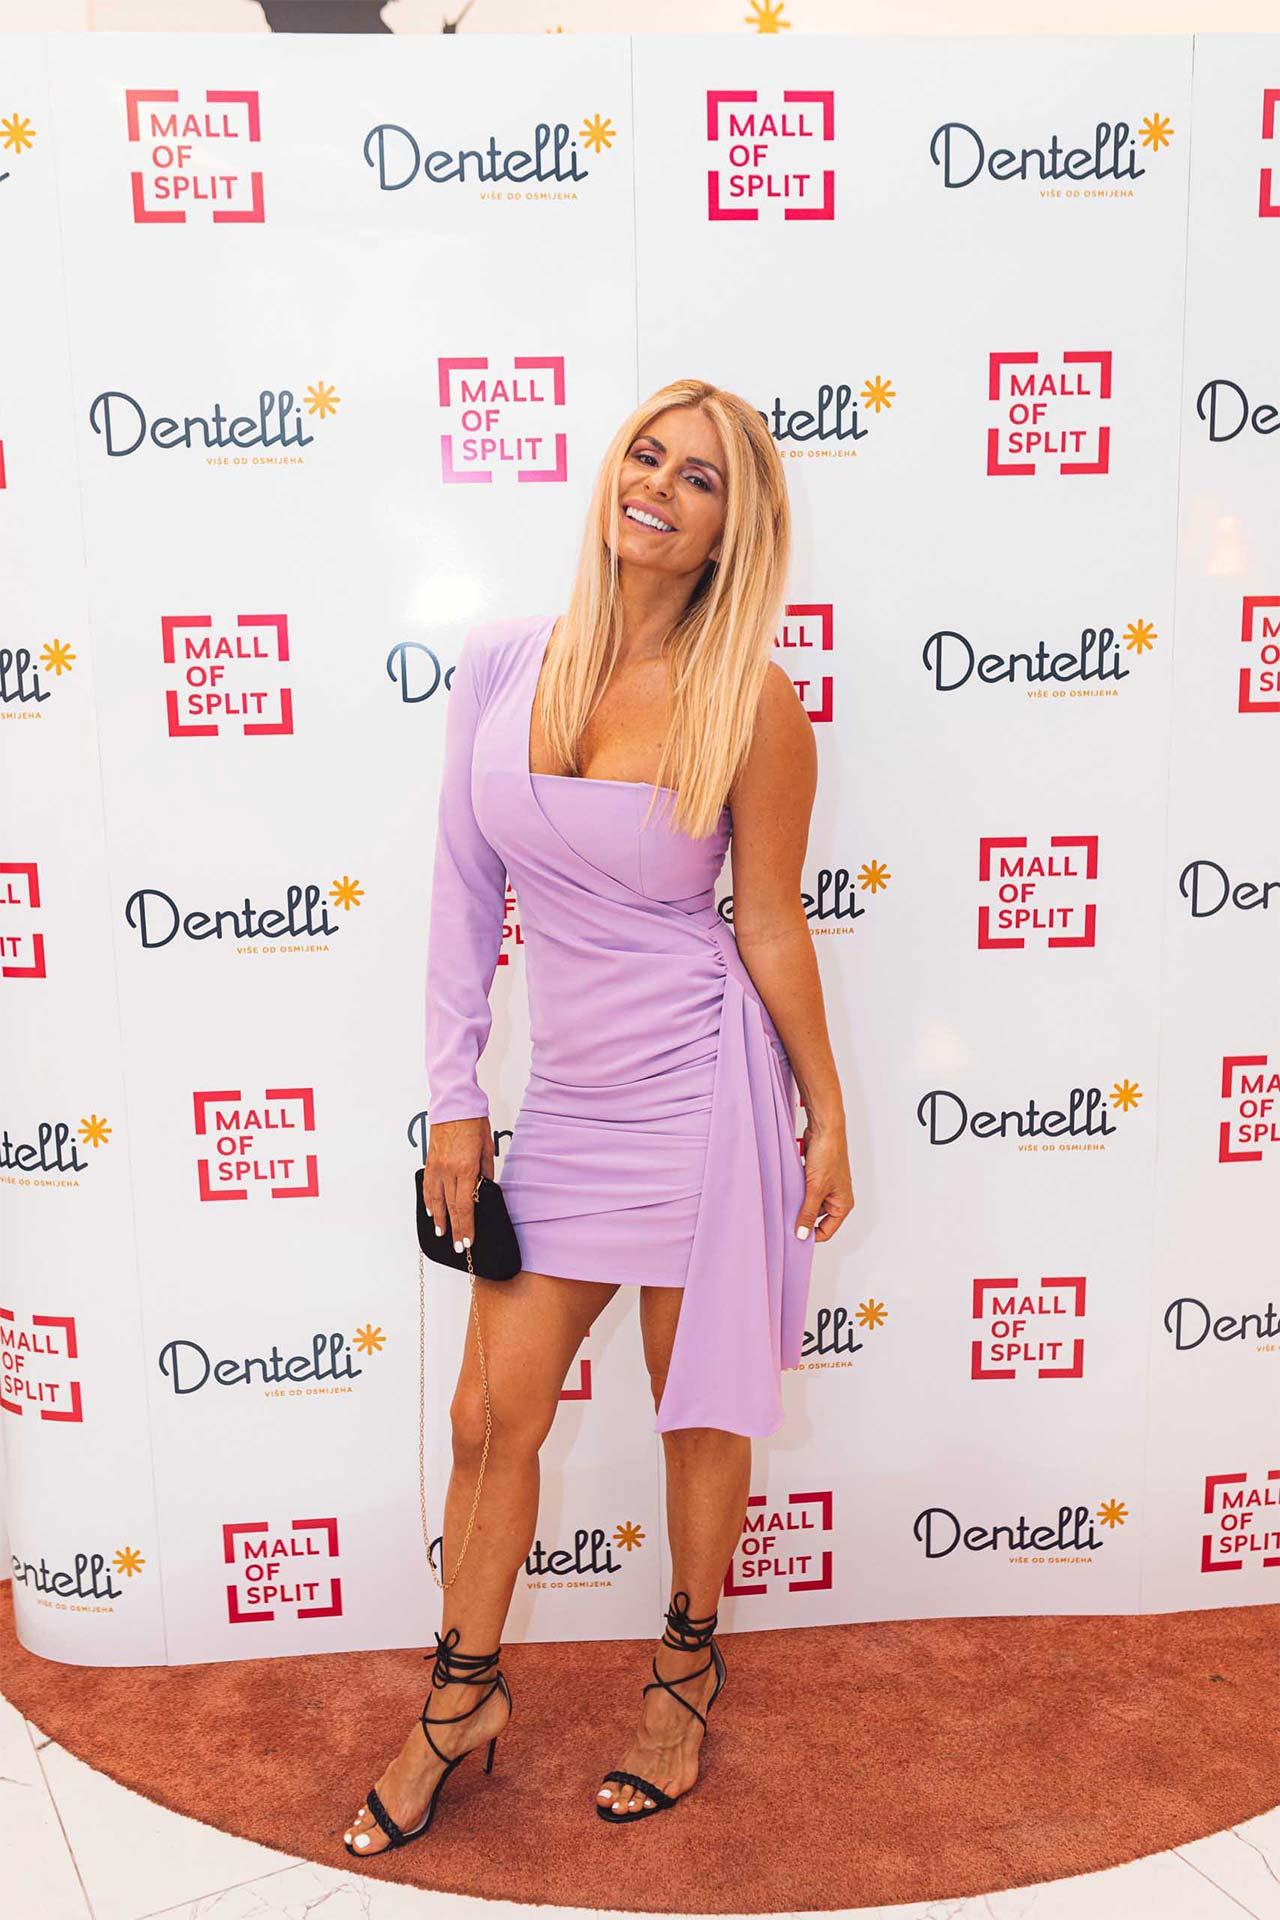 Dentelli Fashion Show - Wall of Fame (4)